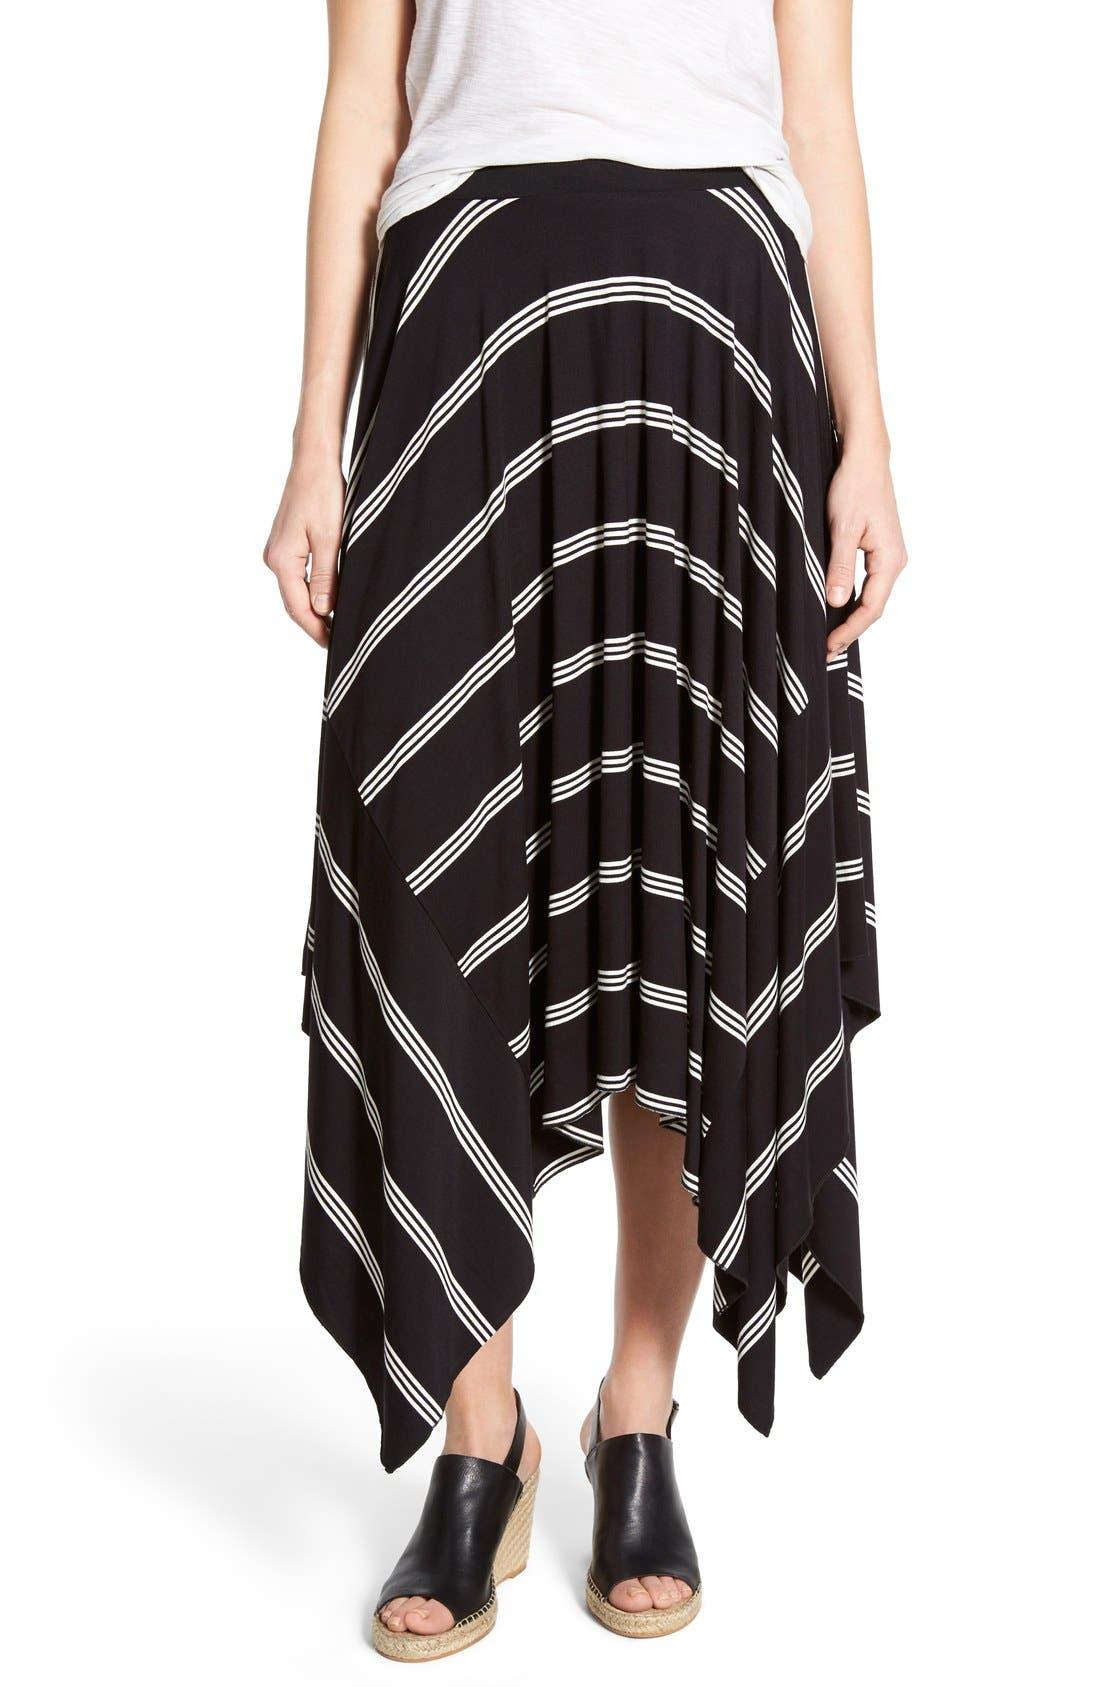 Alternate Image 1 Selected - Halogen® Stretch Knit Handkerchief Hem Maxi Skirt (Regular & Petite)